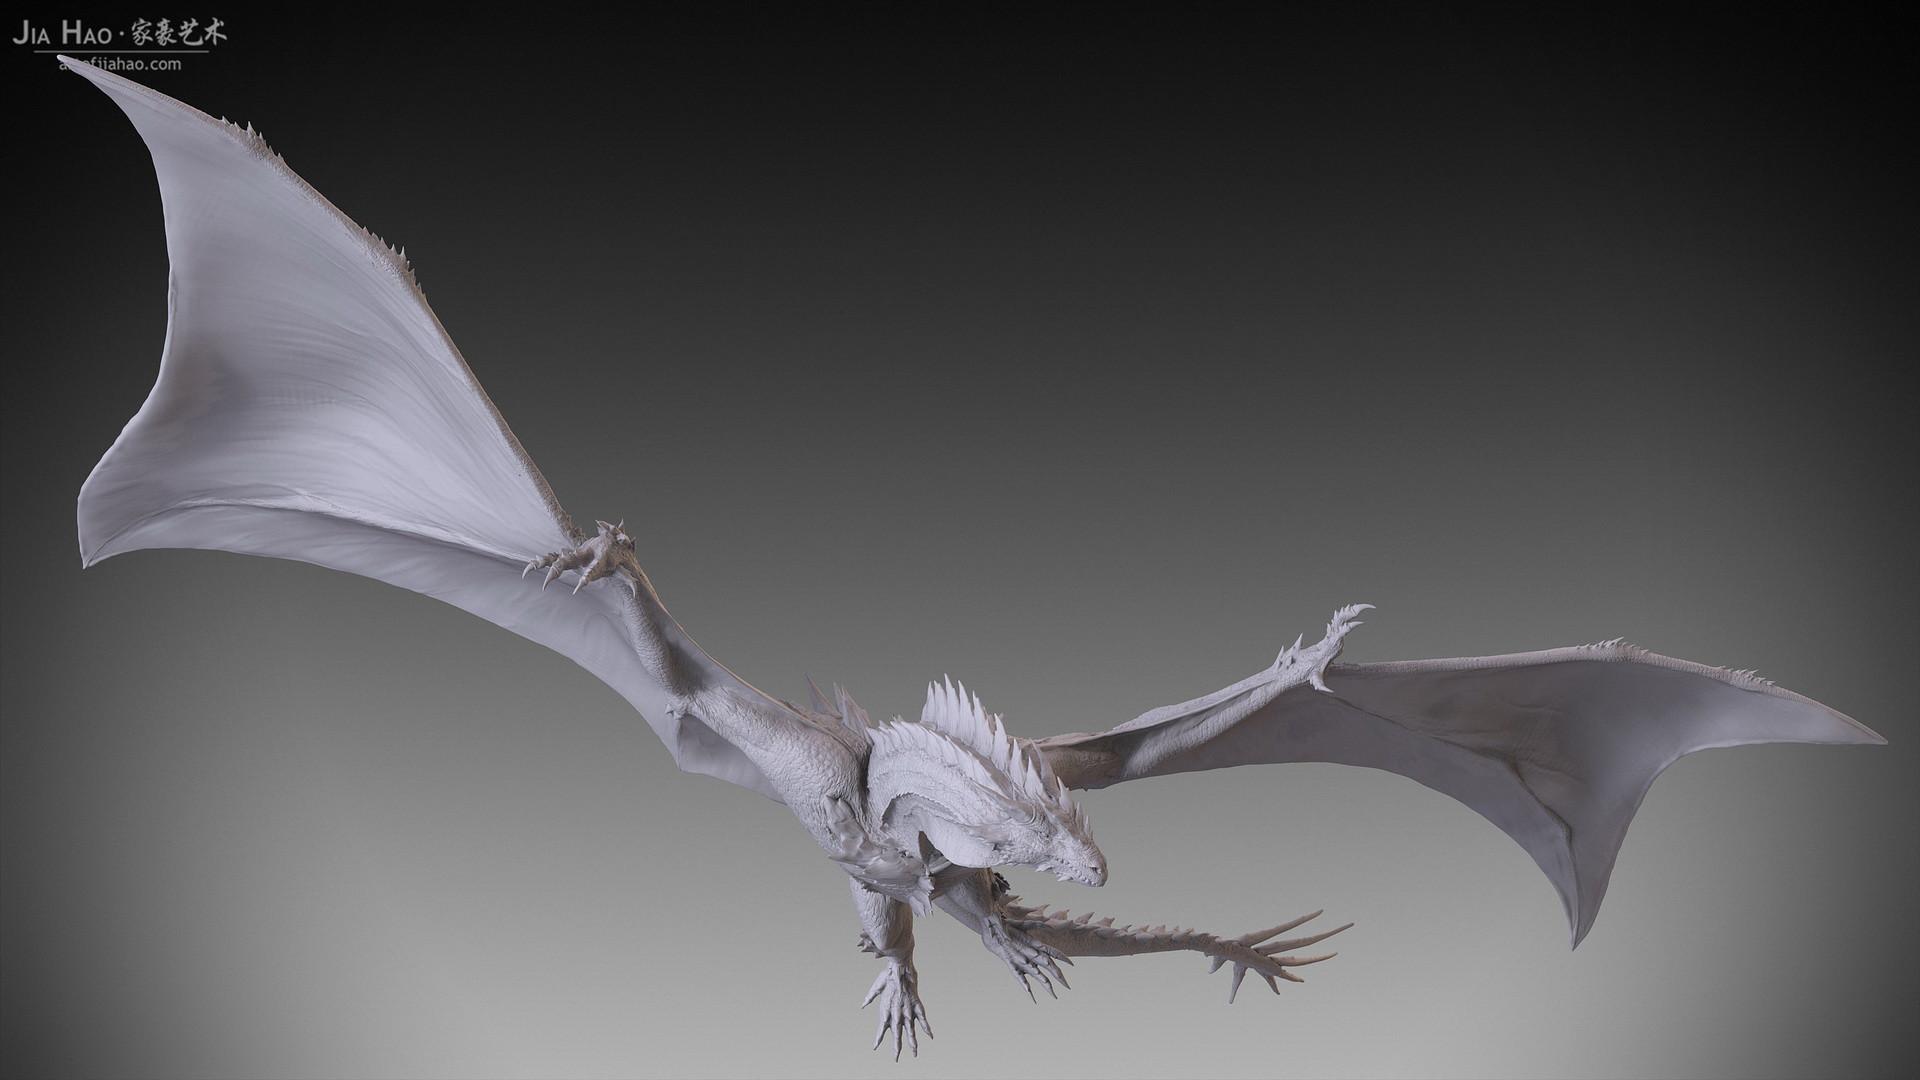 Jia hao 2017 spikydragon flying digitalsculpting 03